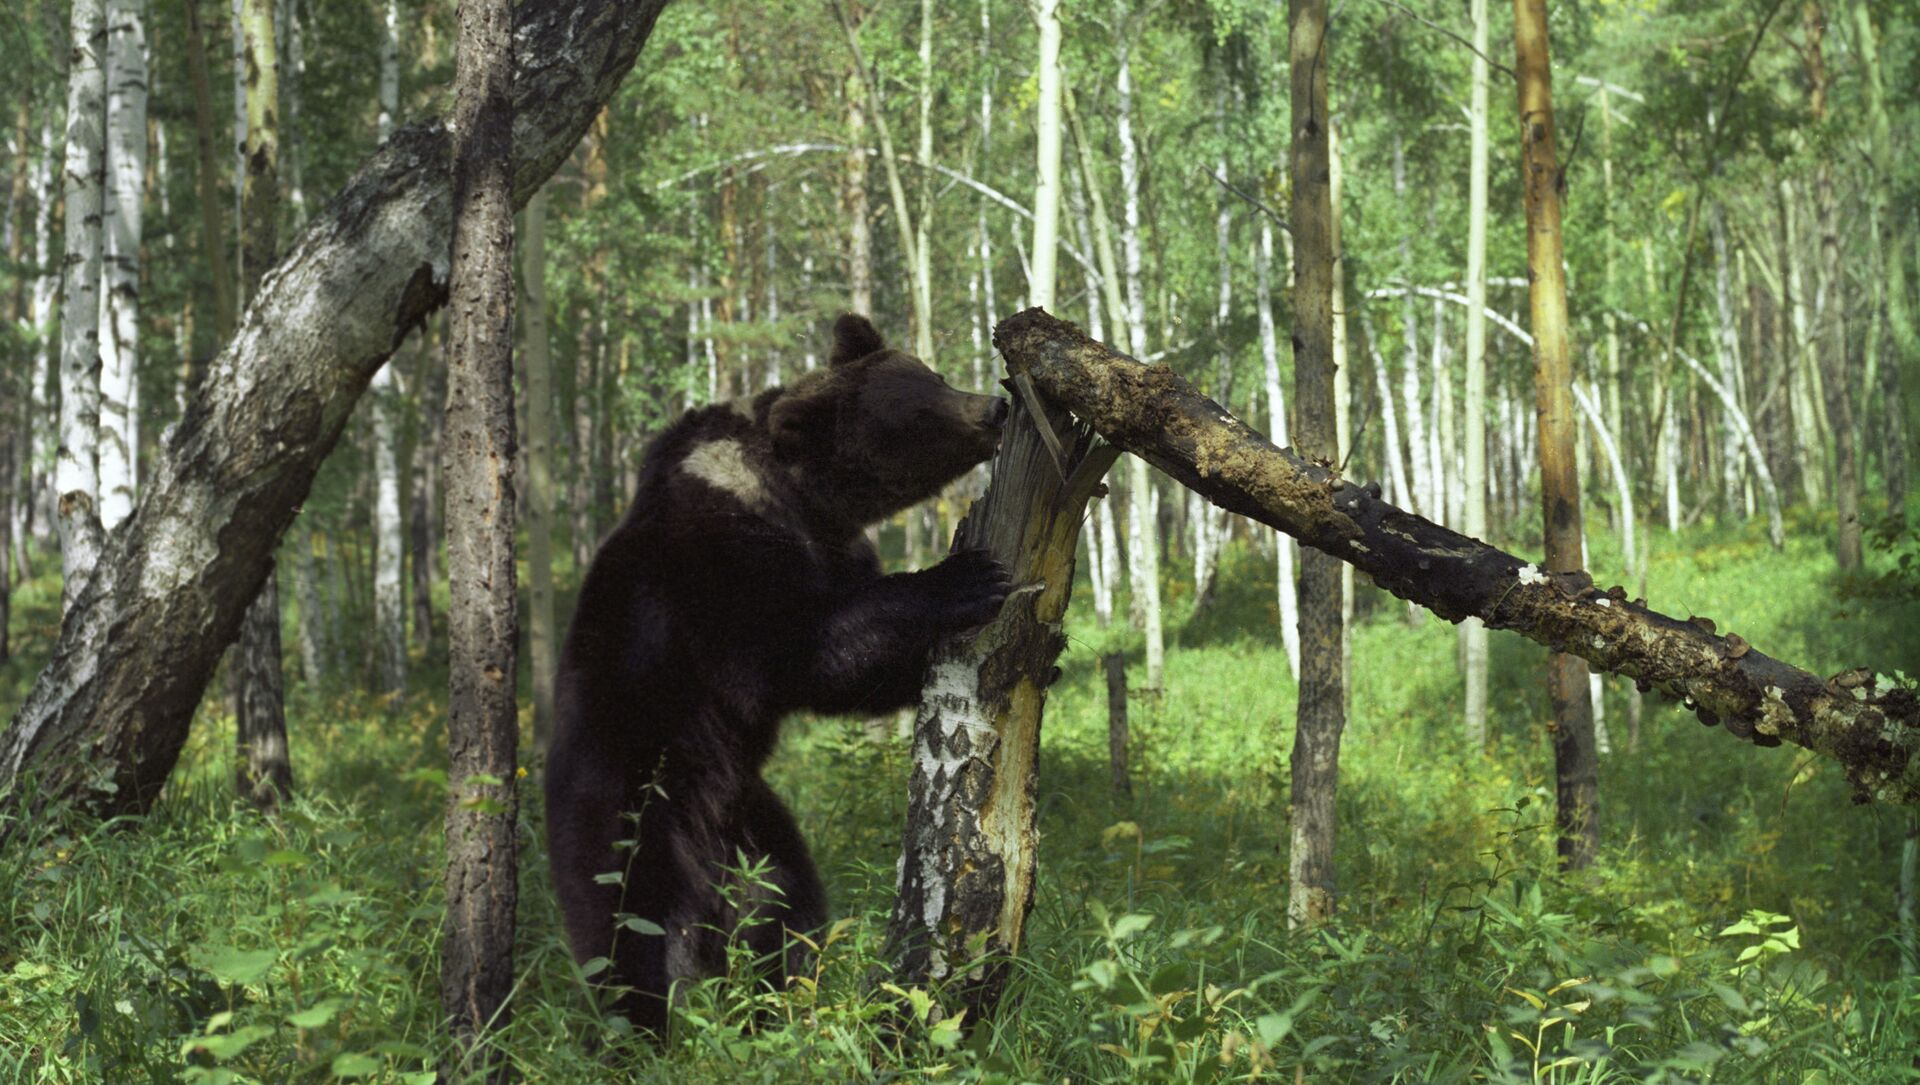 Бурый медведь в лесу - Sputnik Беларусь, 1920, 22.05.2021